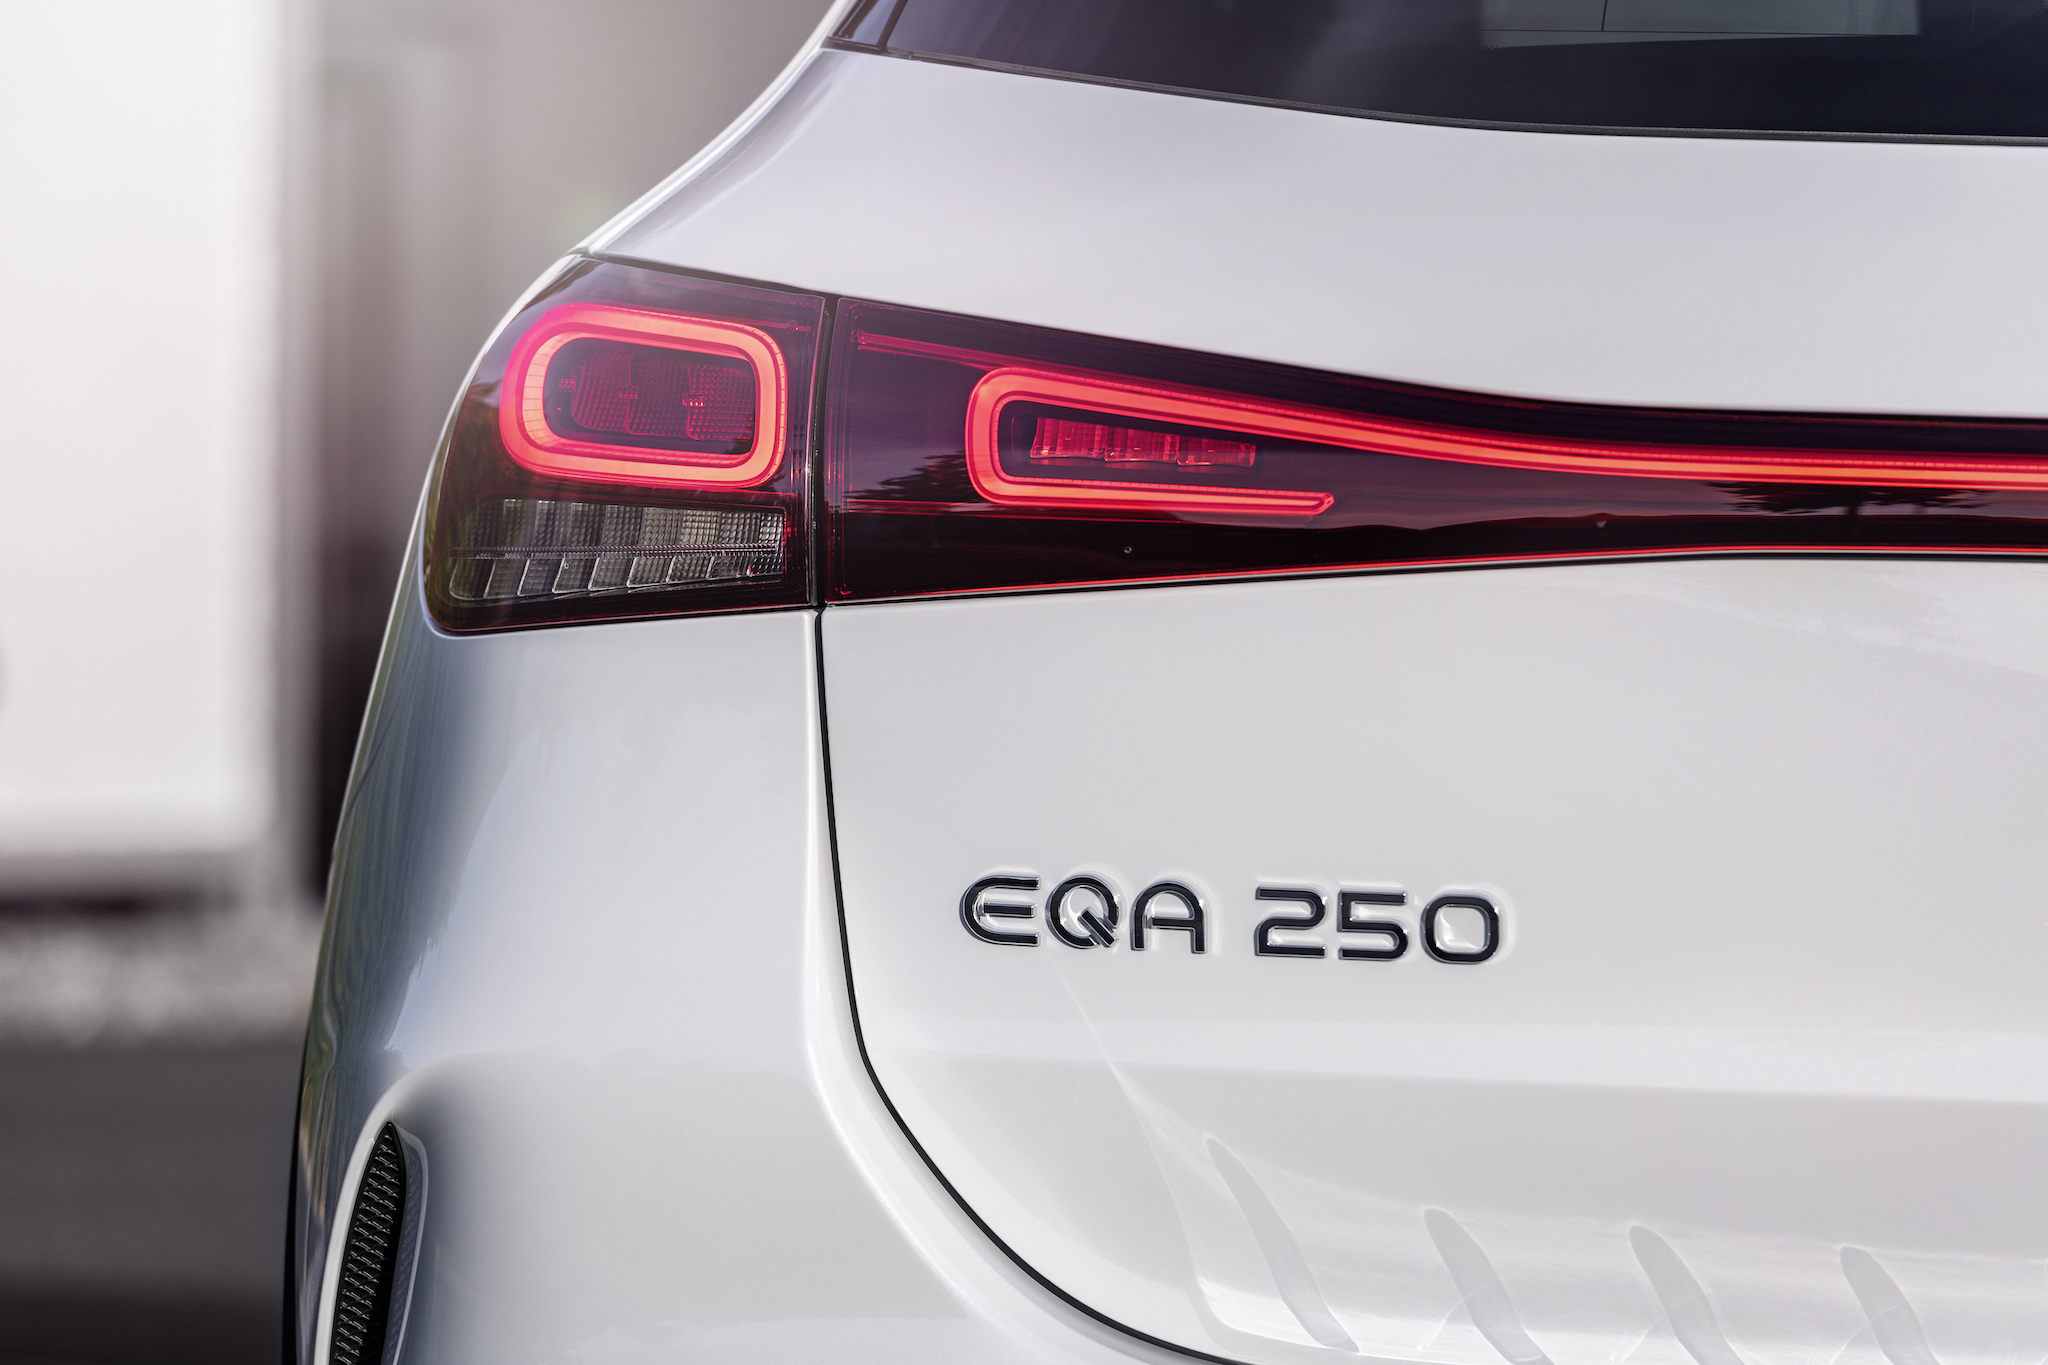 Mercedes-Benz 在 2020 年 1 月下旬發表了旗下首款緊湊型純電車款 EQA。